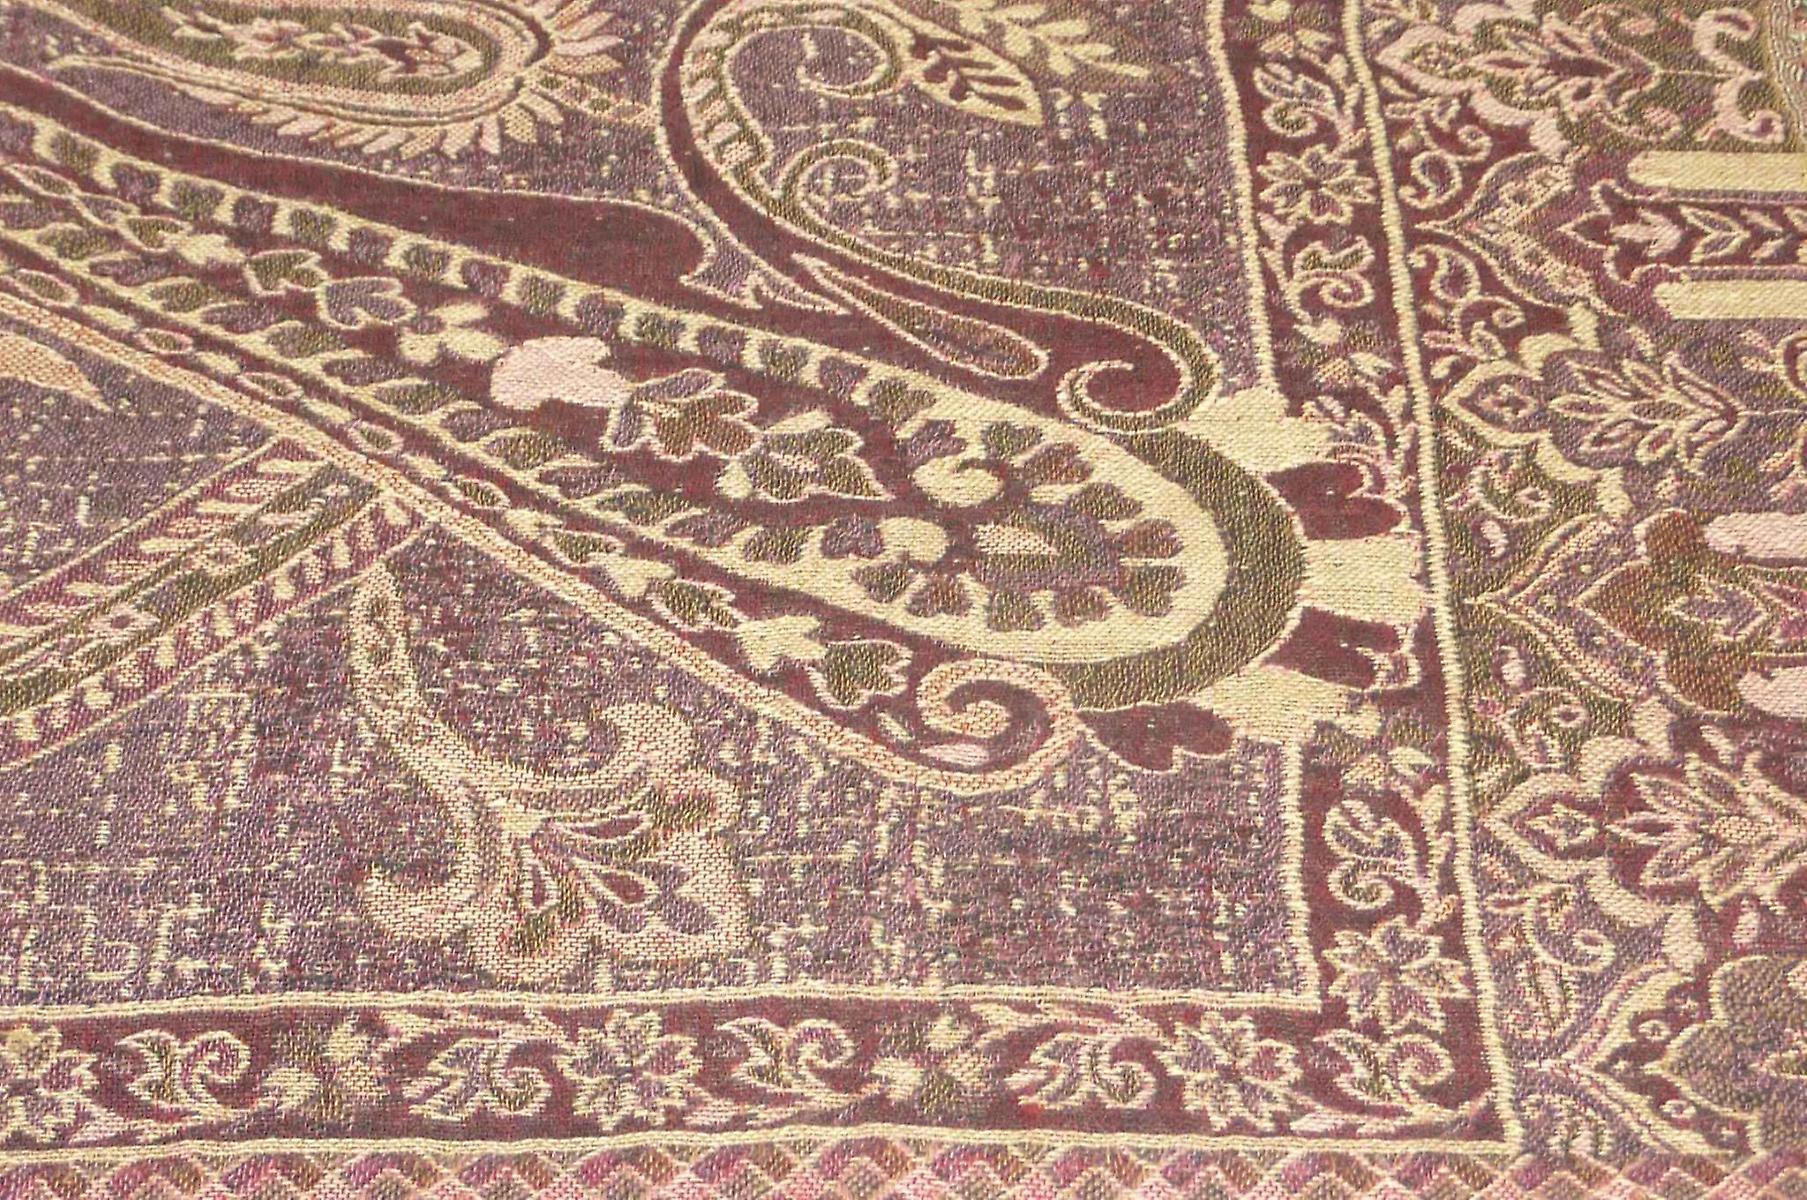 Mens Muffler Scarf 4939 Fine Pashmina Wool by Pashmina & Silk